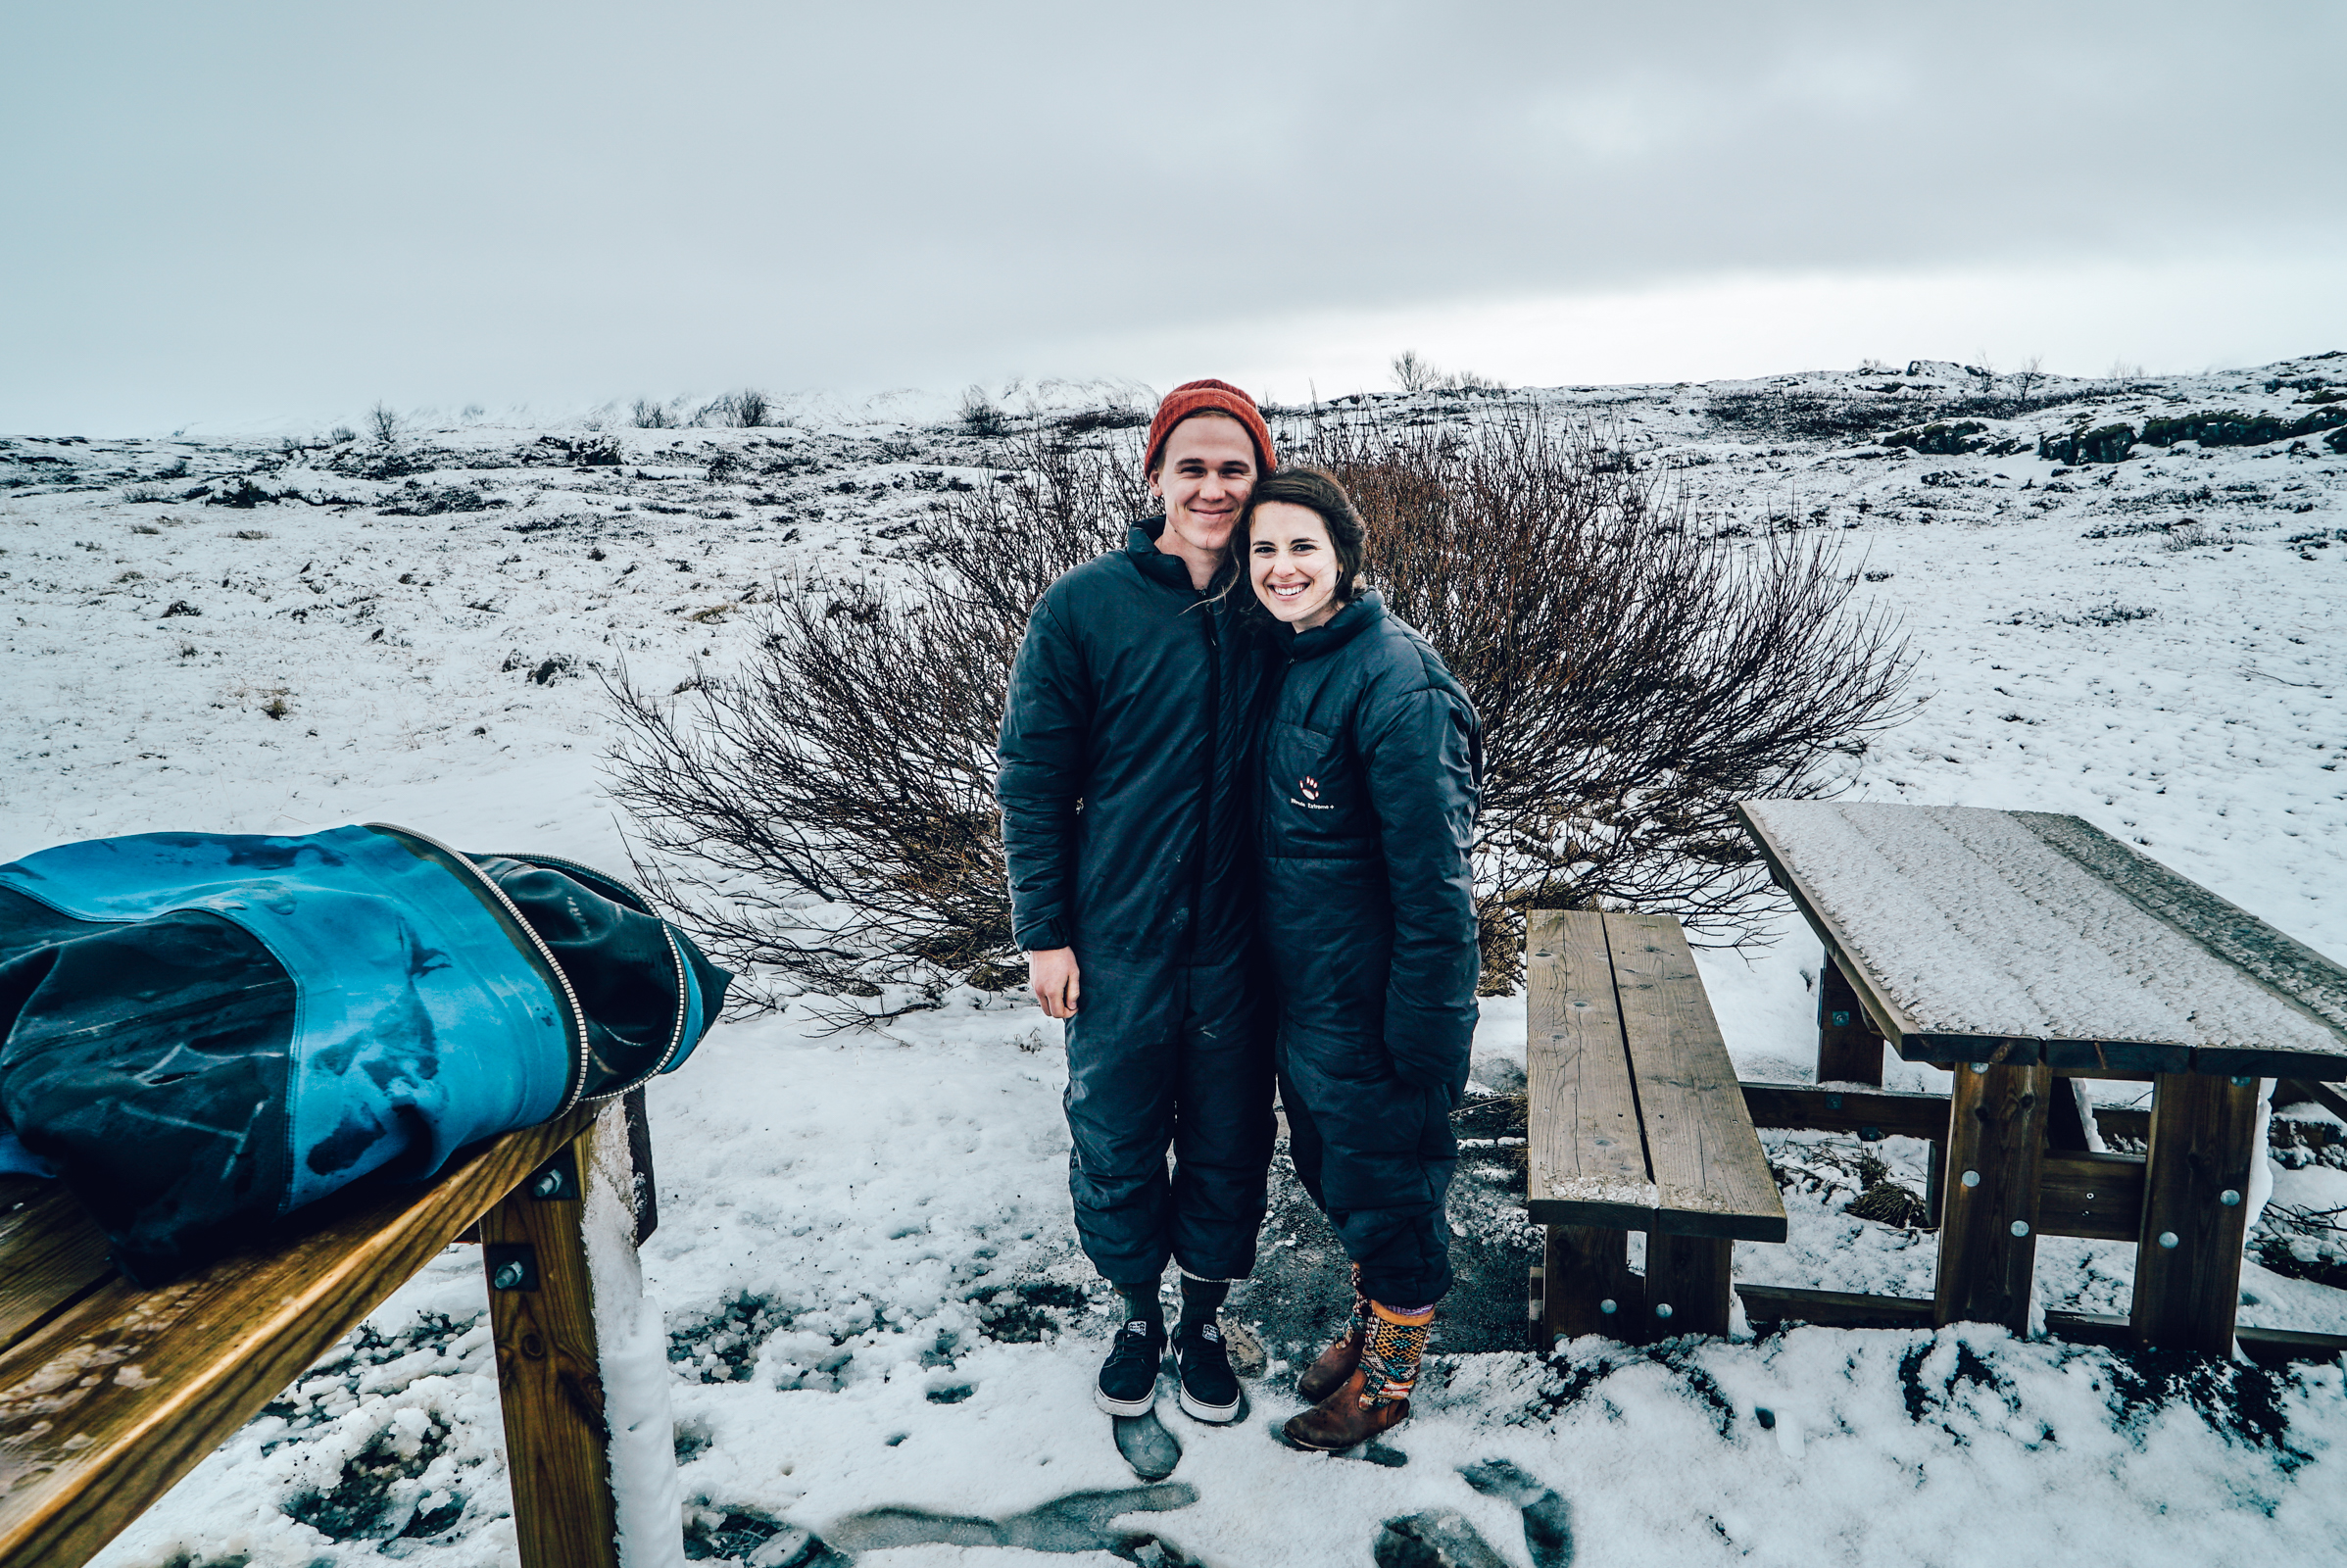 arctic-adventures-1.jpg